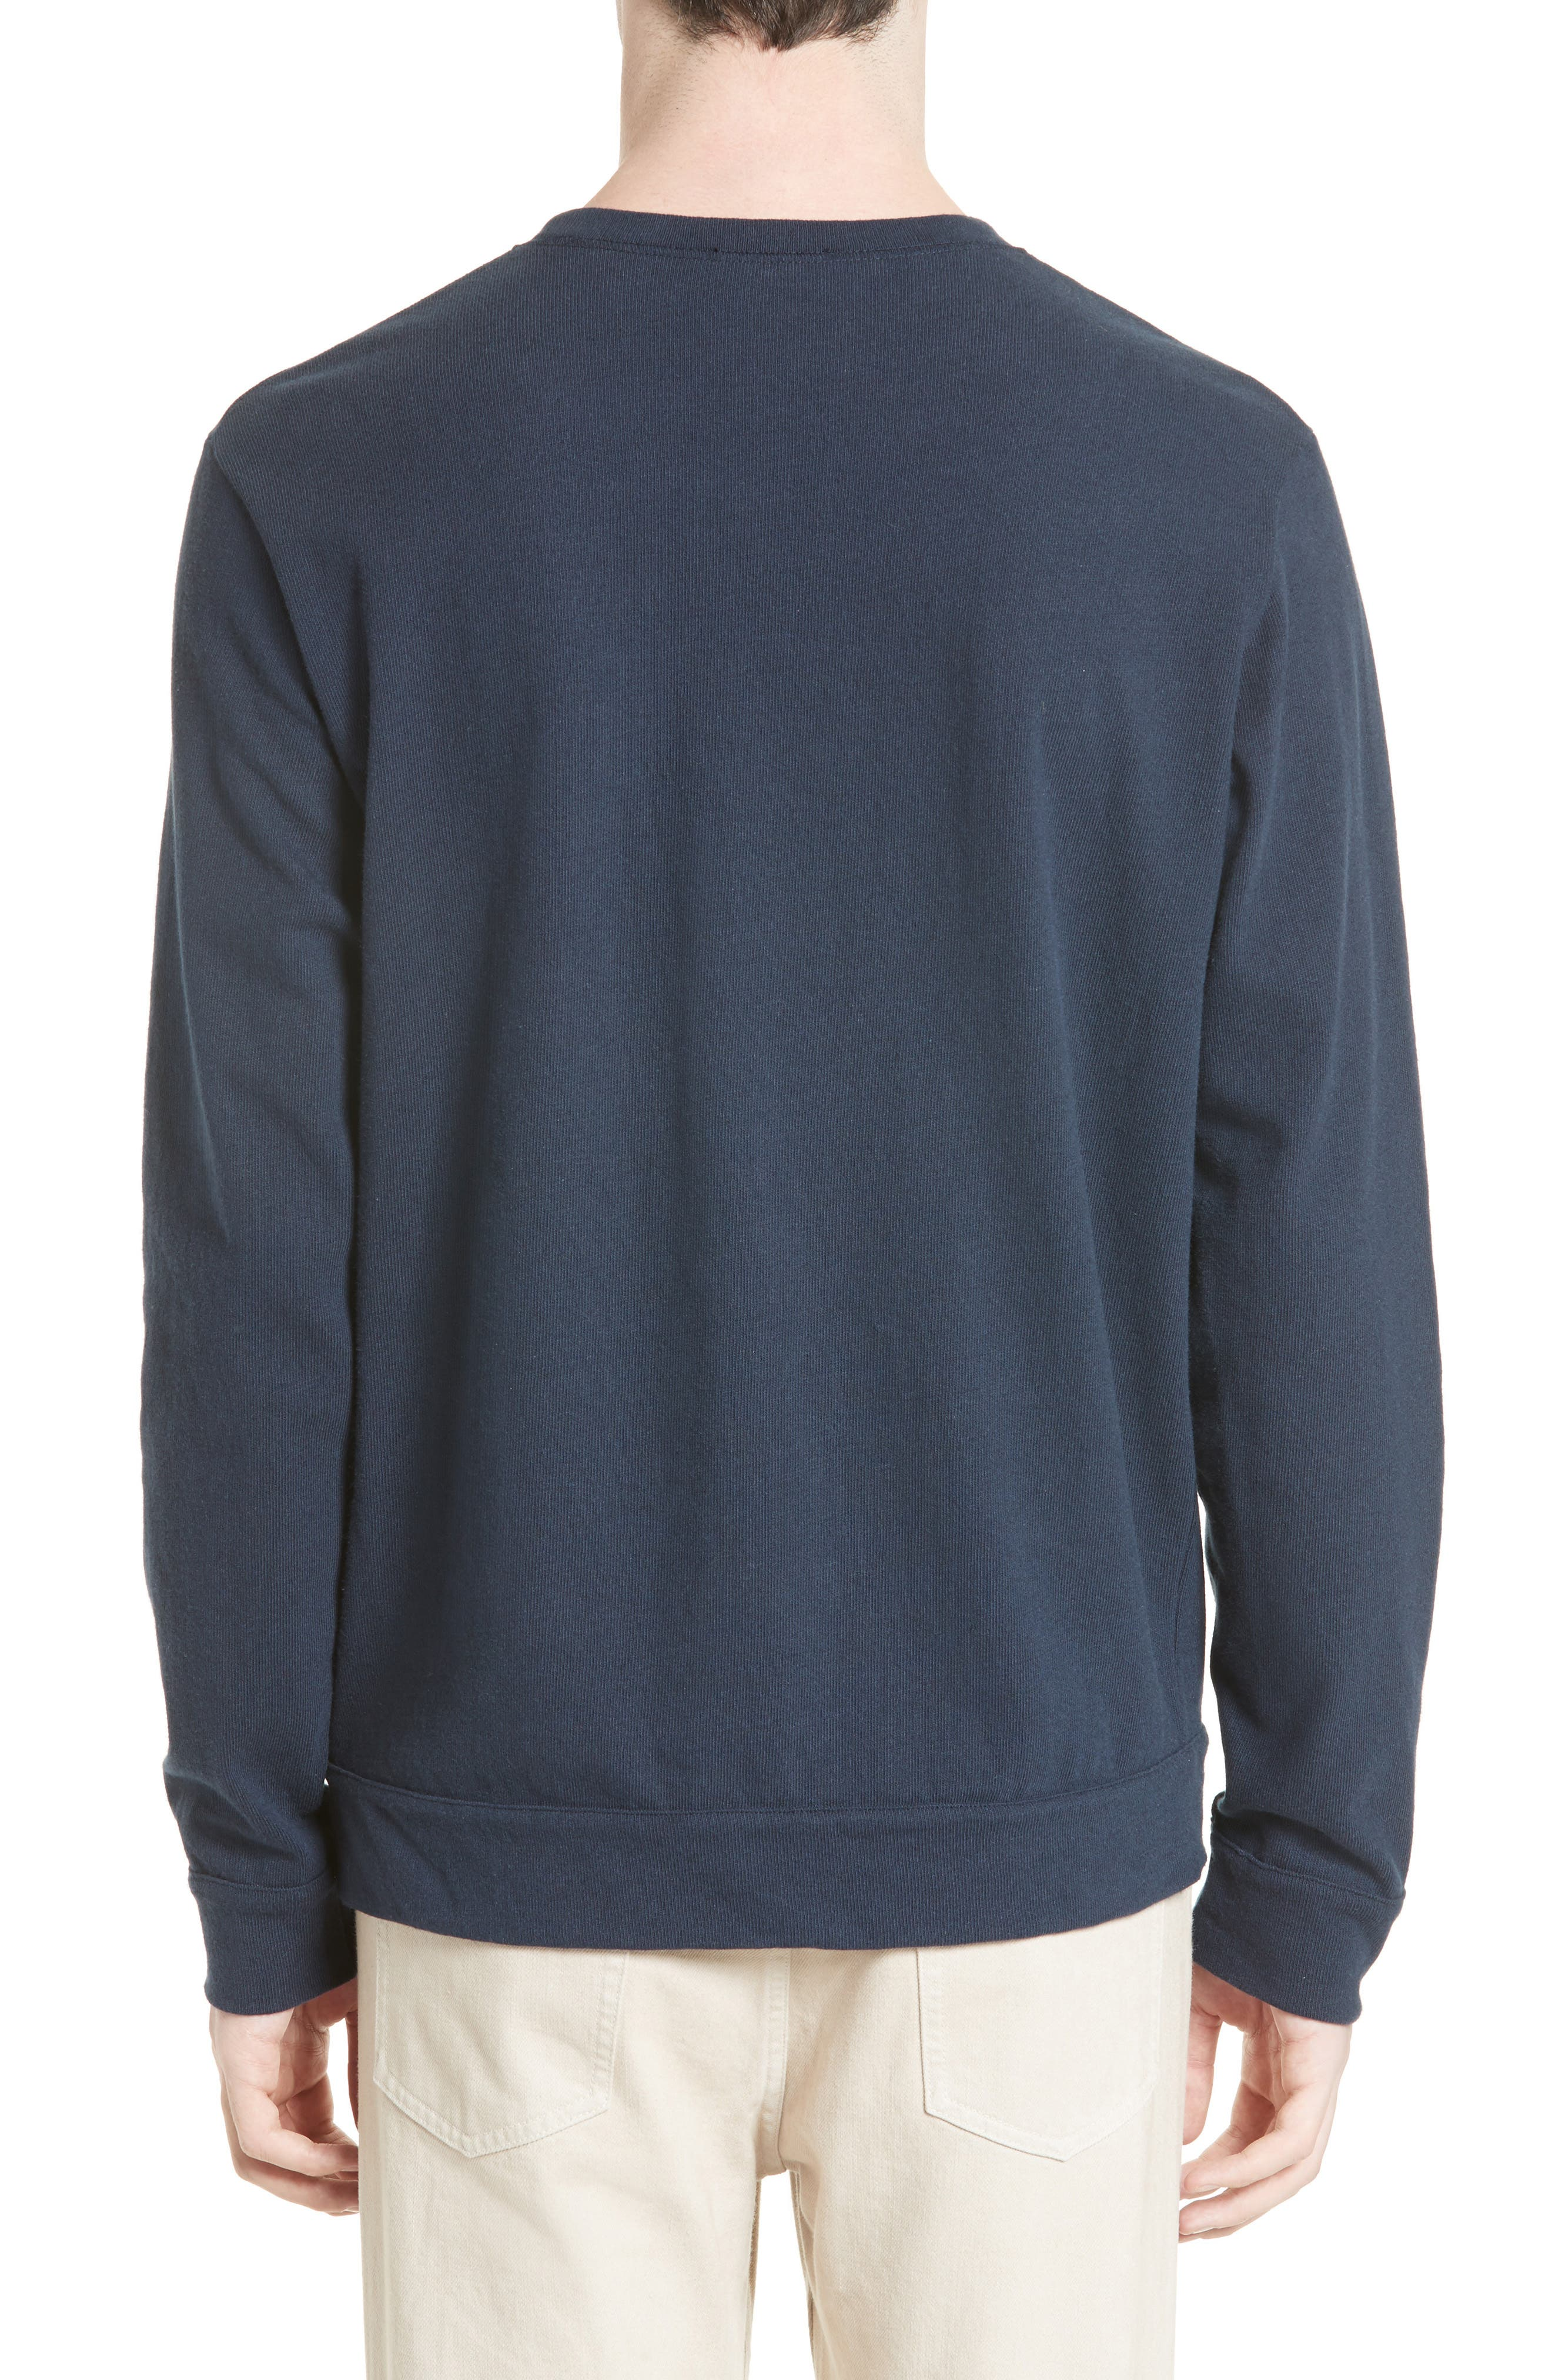 Hike Sweatshirt,                             Alternate thumbnail 2, color,                             410